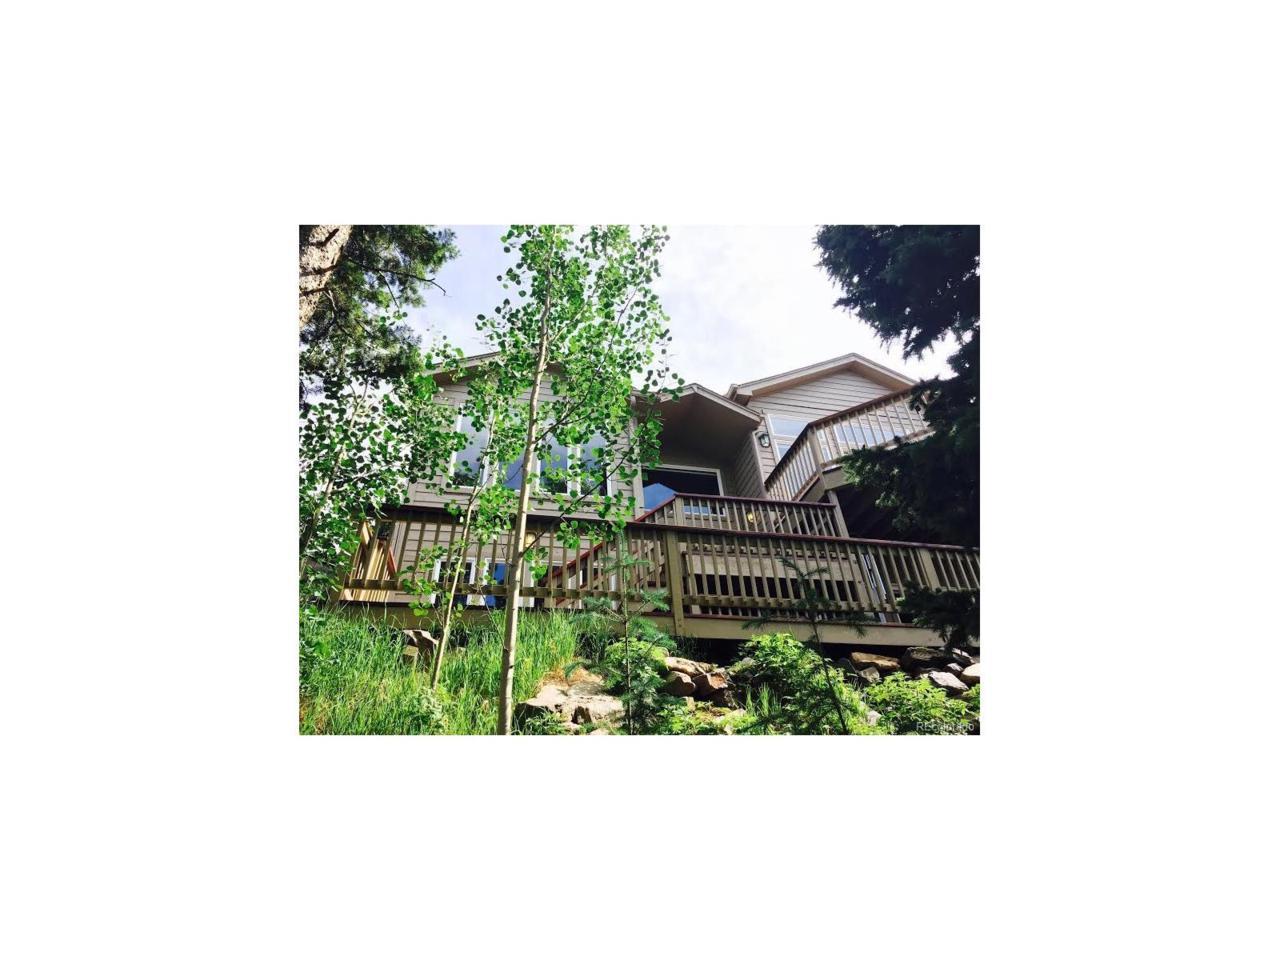 1944 Sinton Road, Evergreen, CO 80439 (MLS #6962724) :: 8z Real Estate